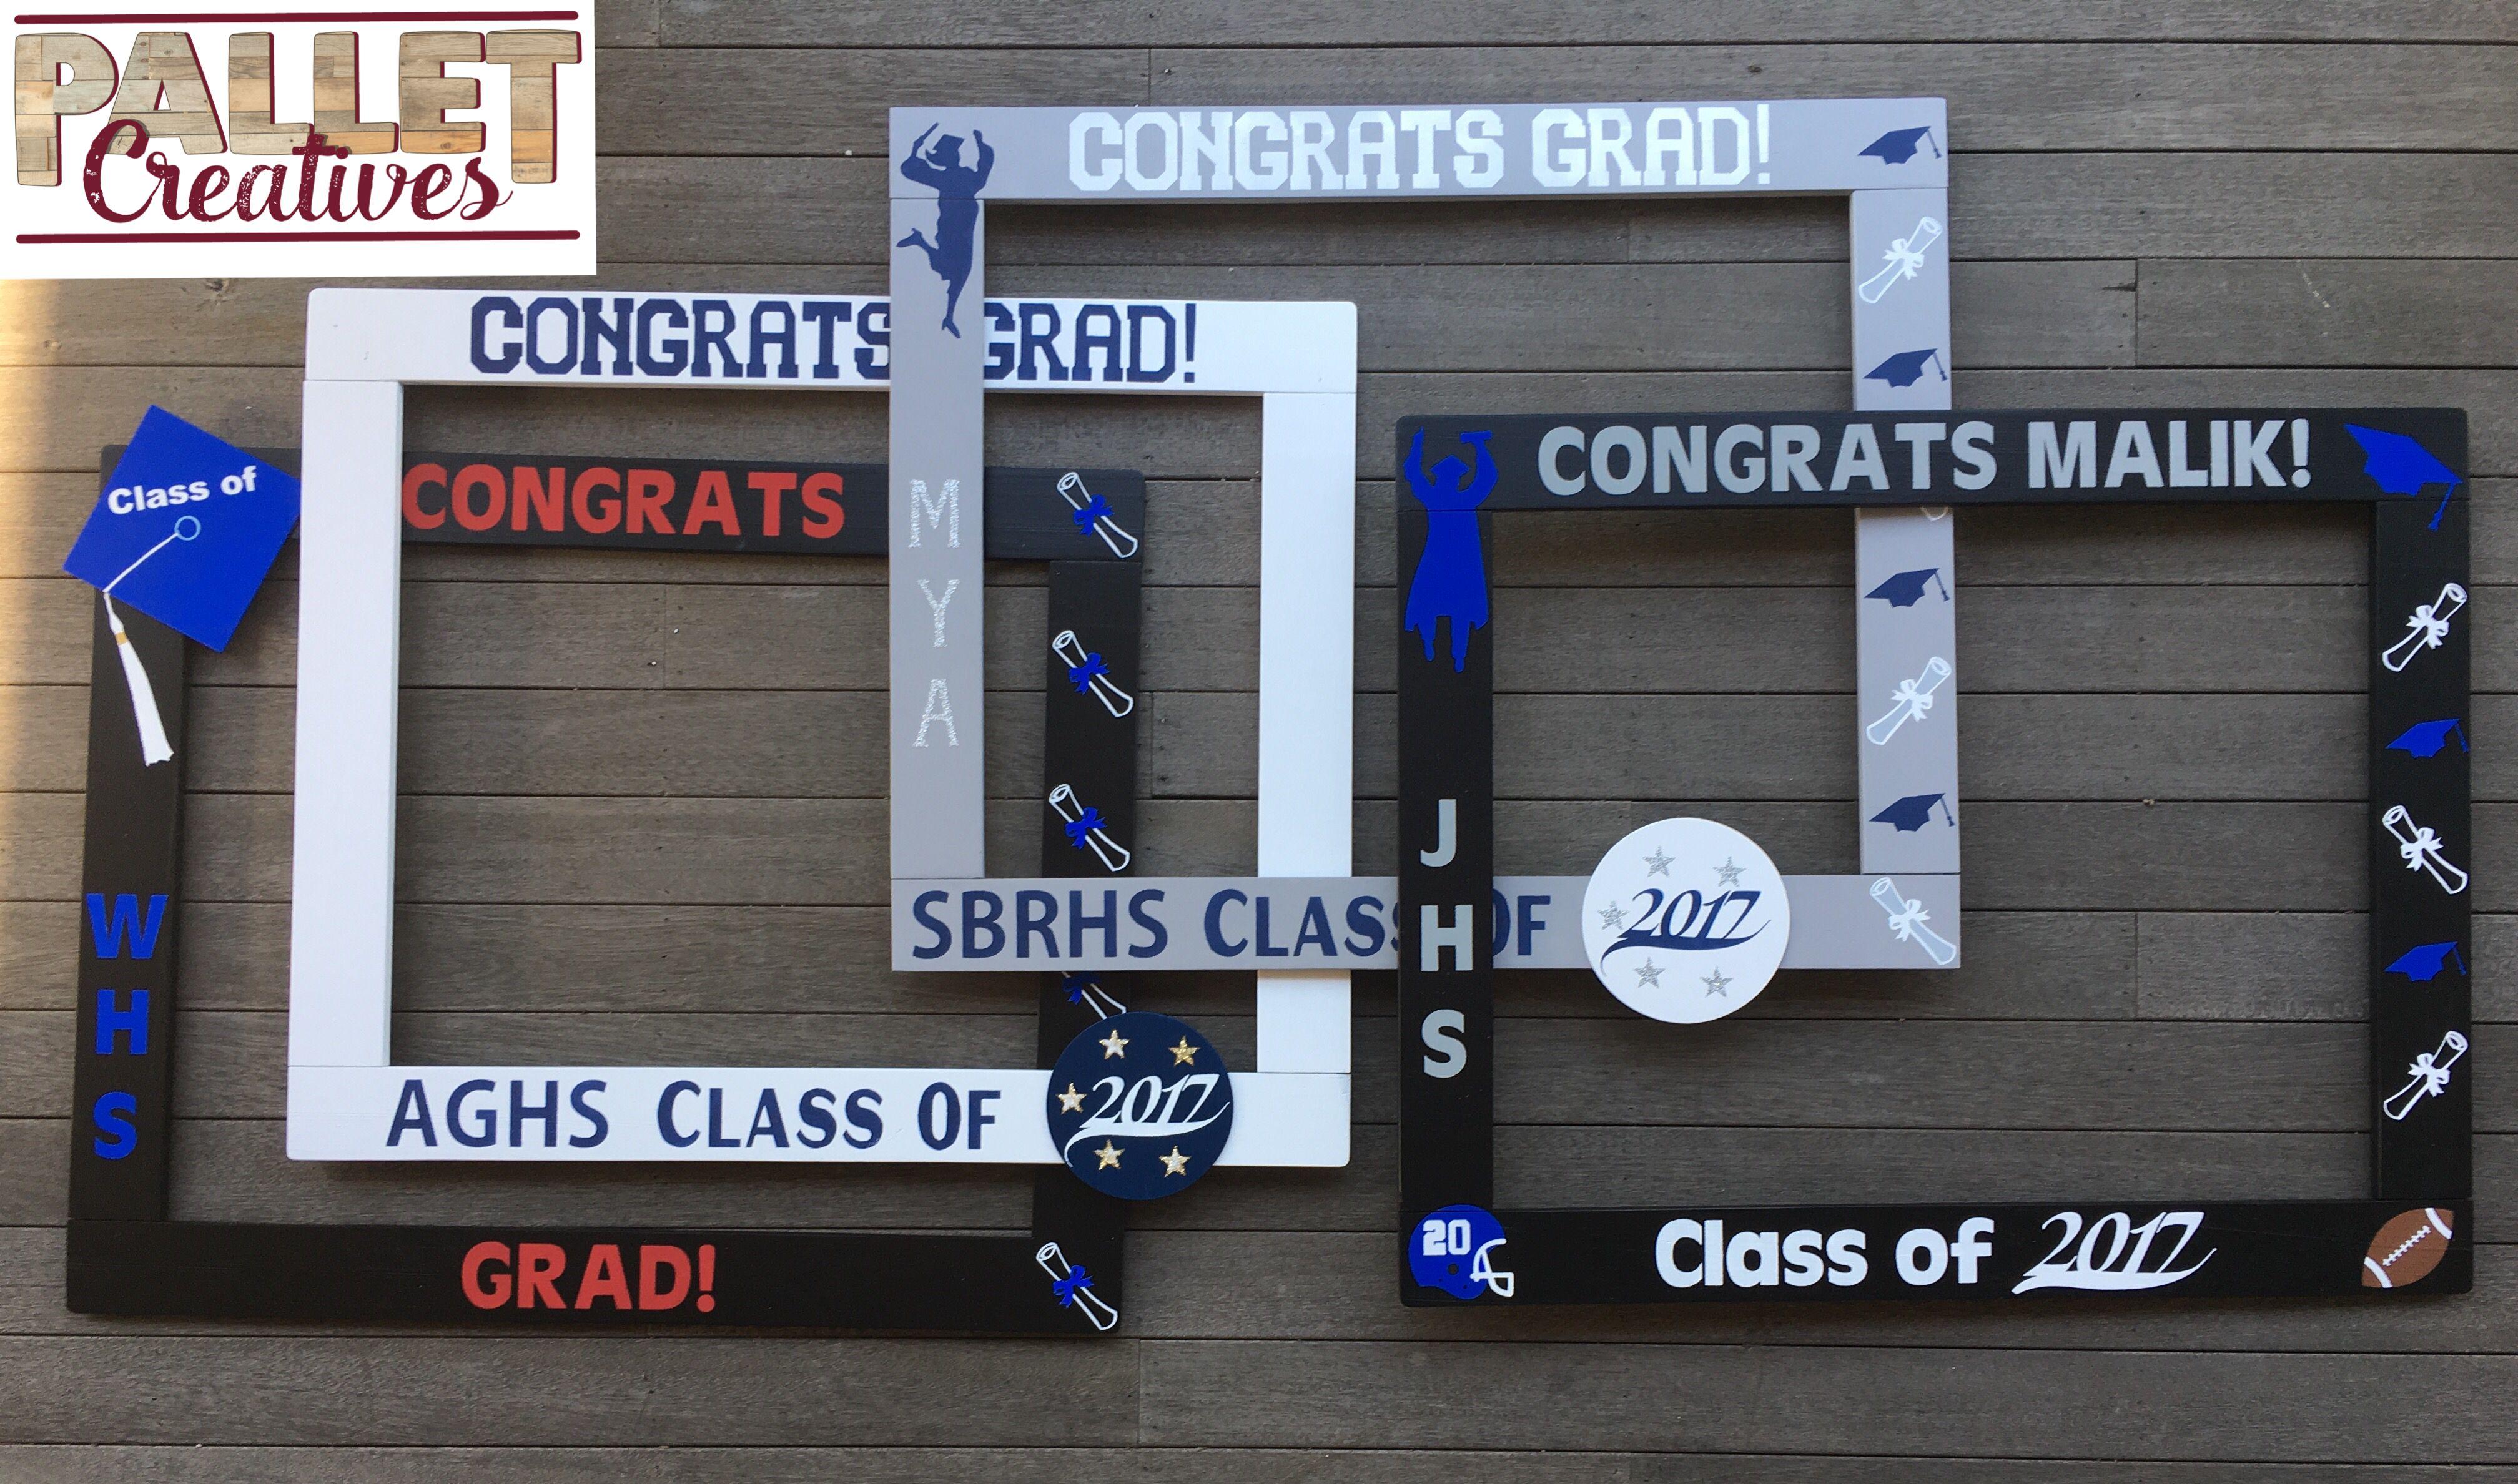 Graduation Photobooth - Congrats Grad Photo Booth - Class of 2017 Frame Prop - Grad Photobooth Frame Prop